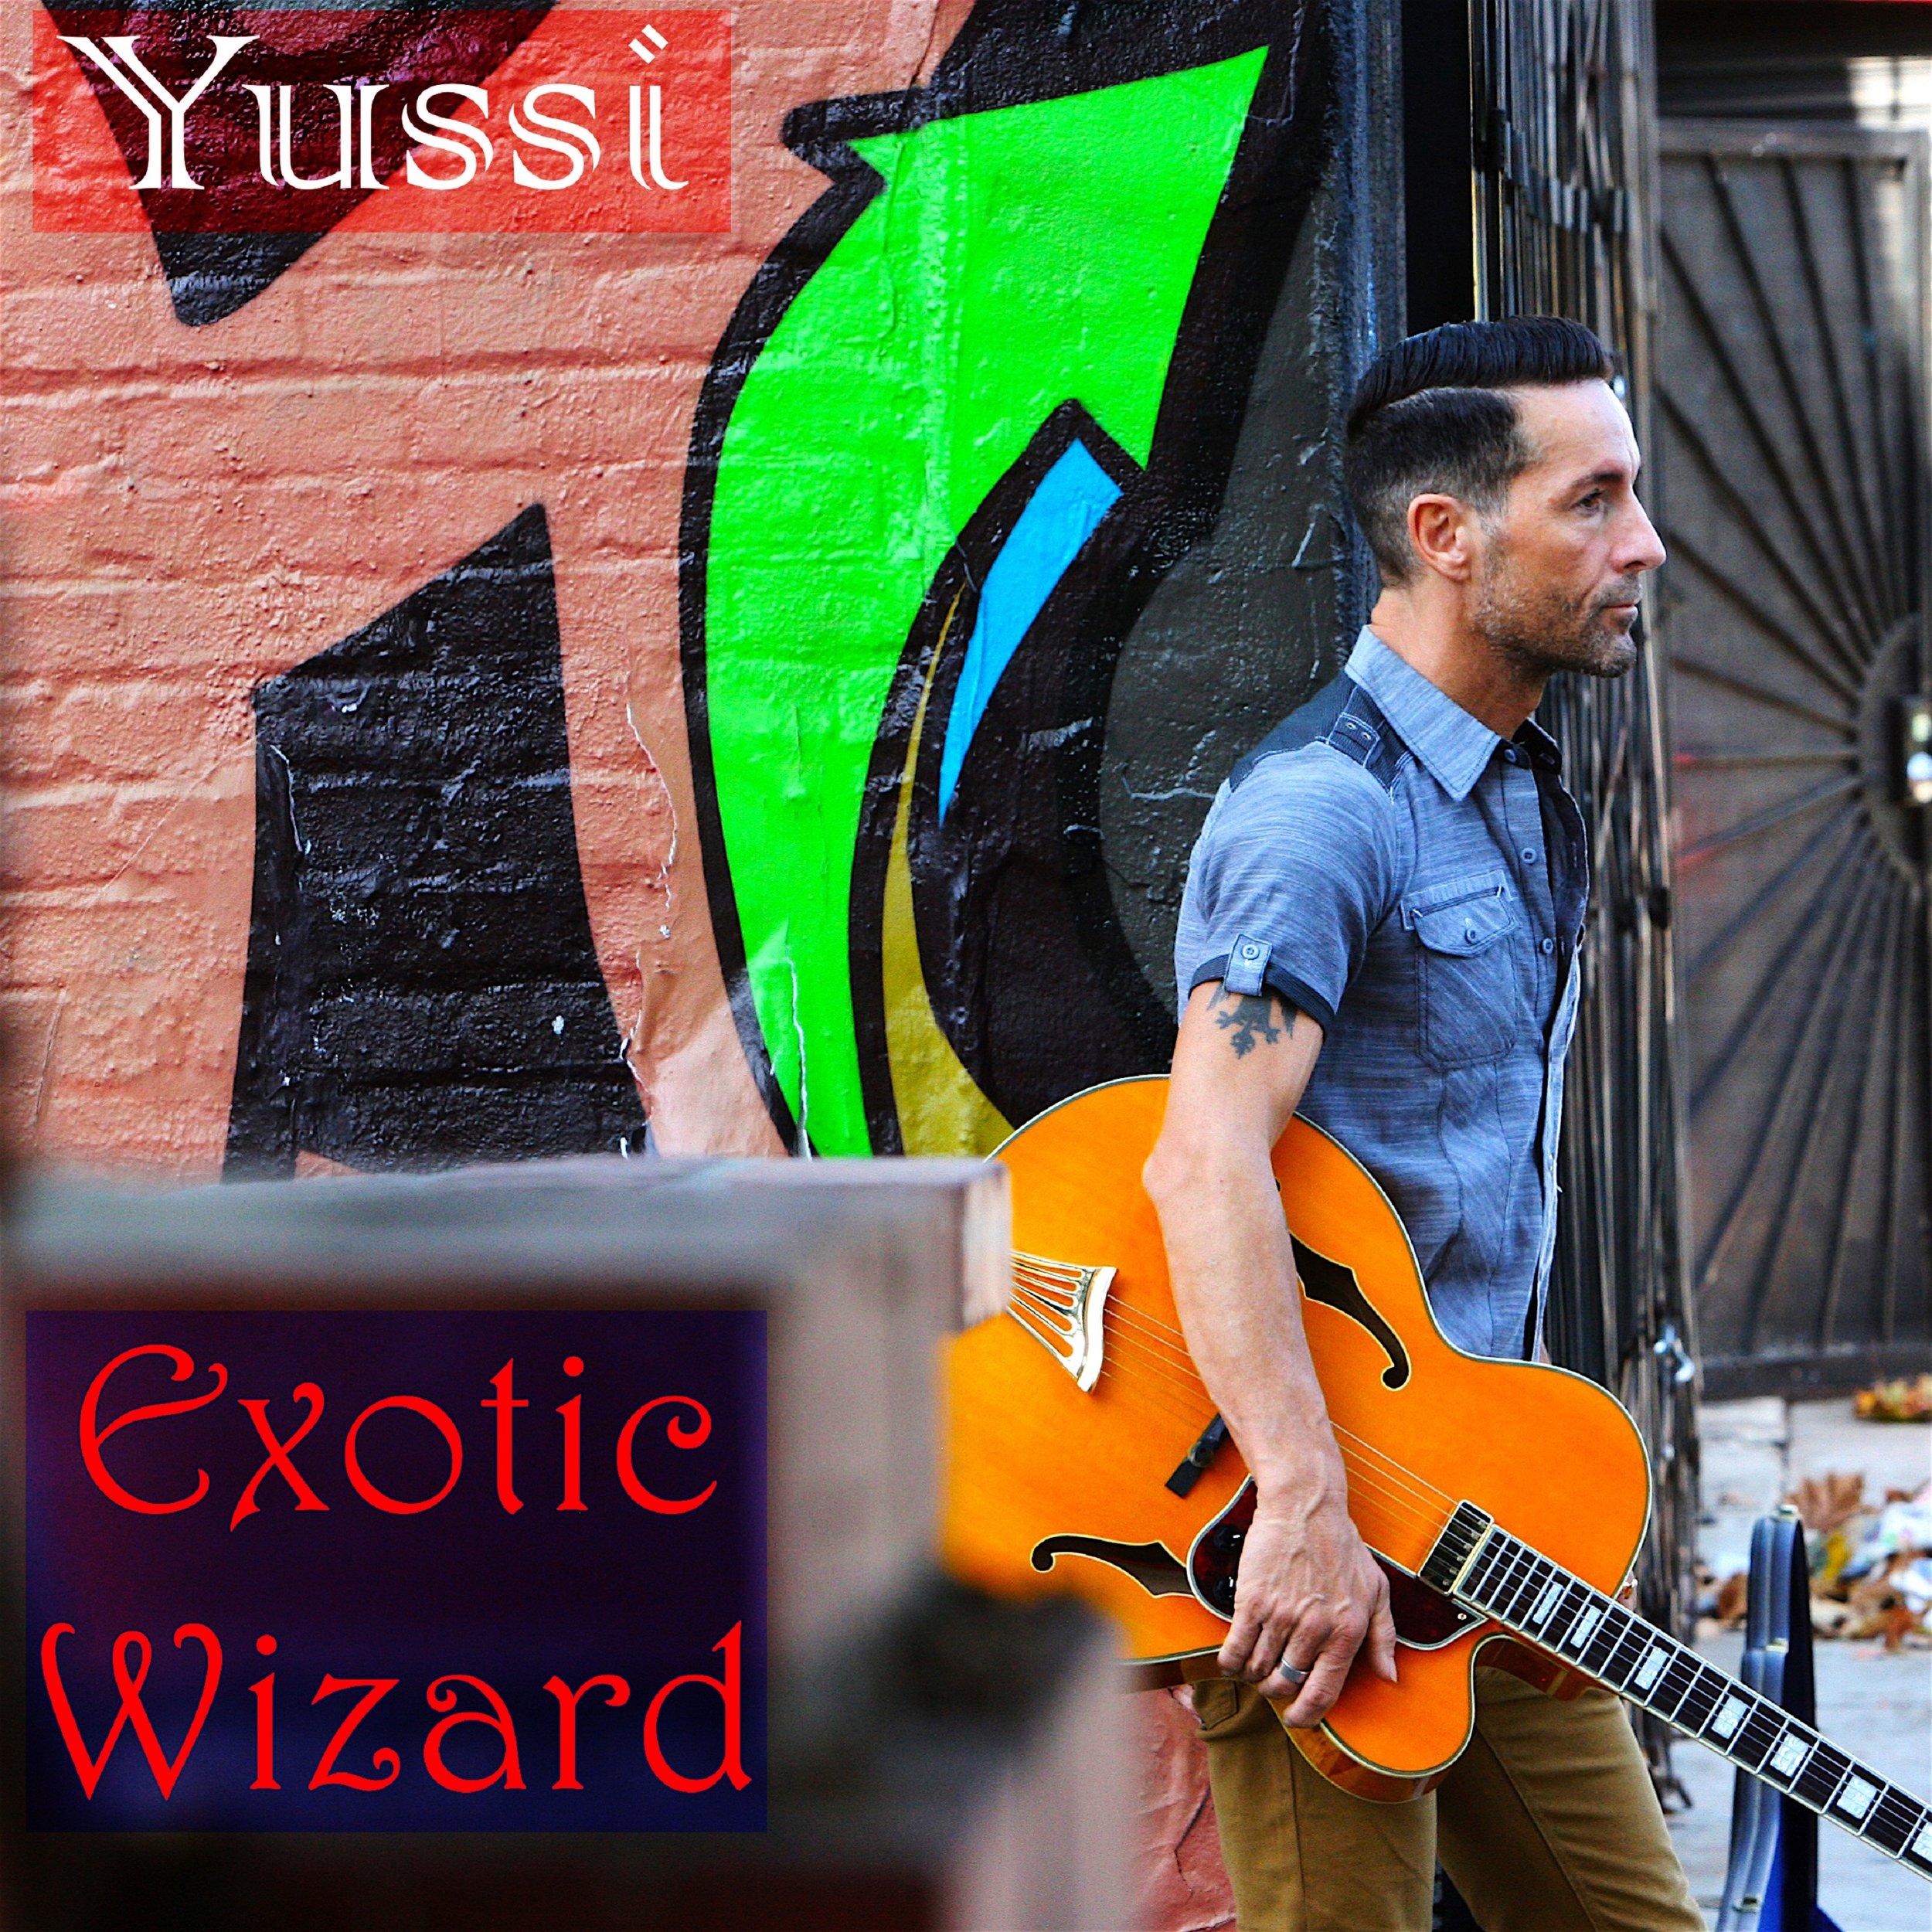 X DOT 25 Music - Yussi — X DOT 25 Music